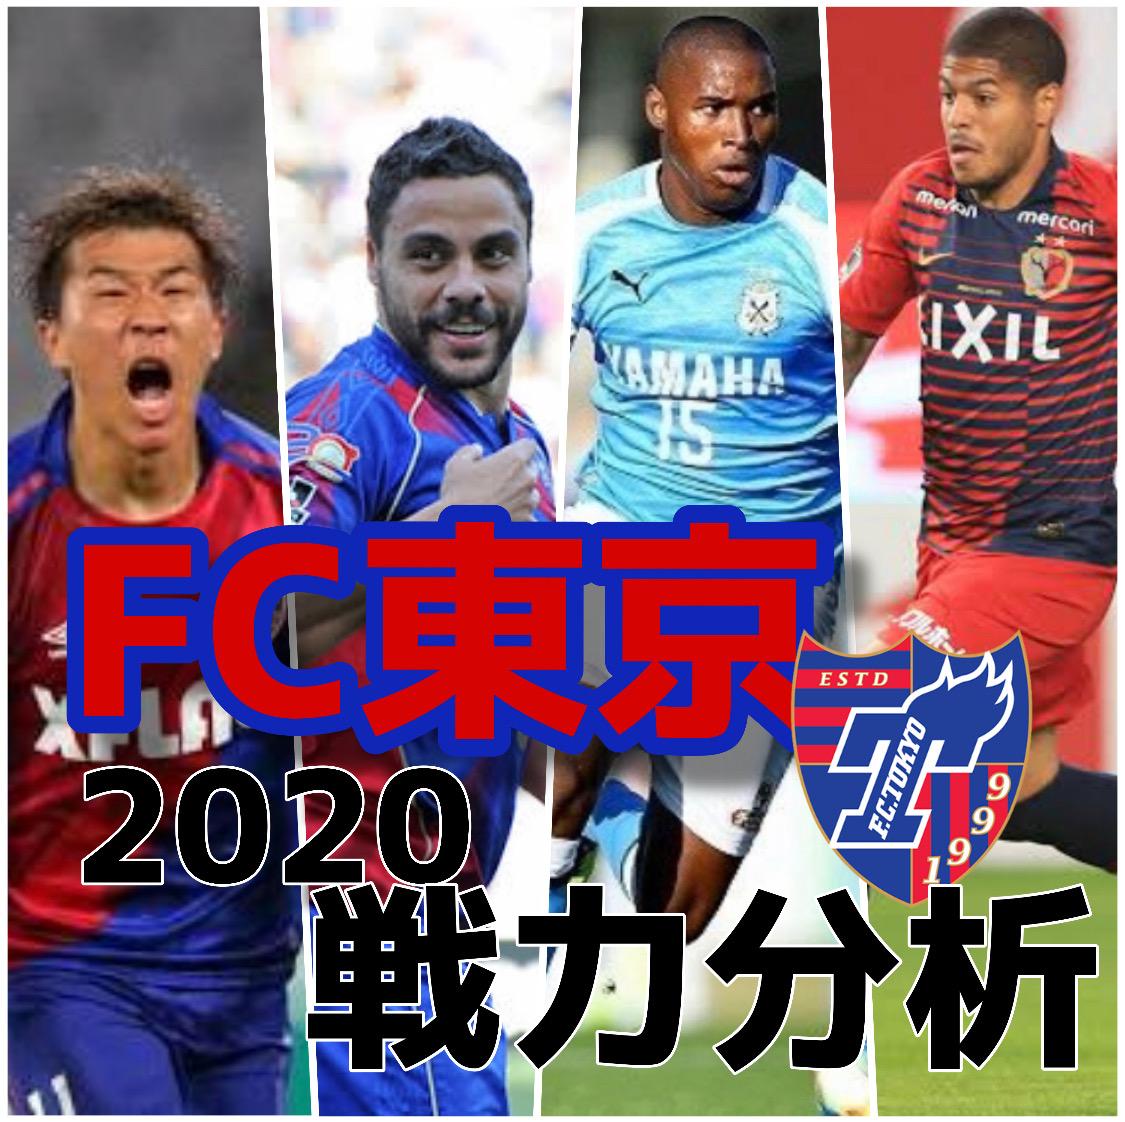 f:id:yamadaman0618:20200125103629j:plain